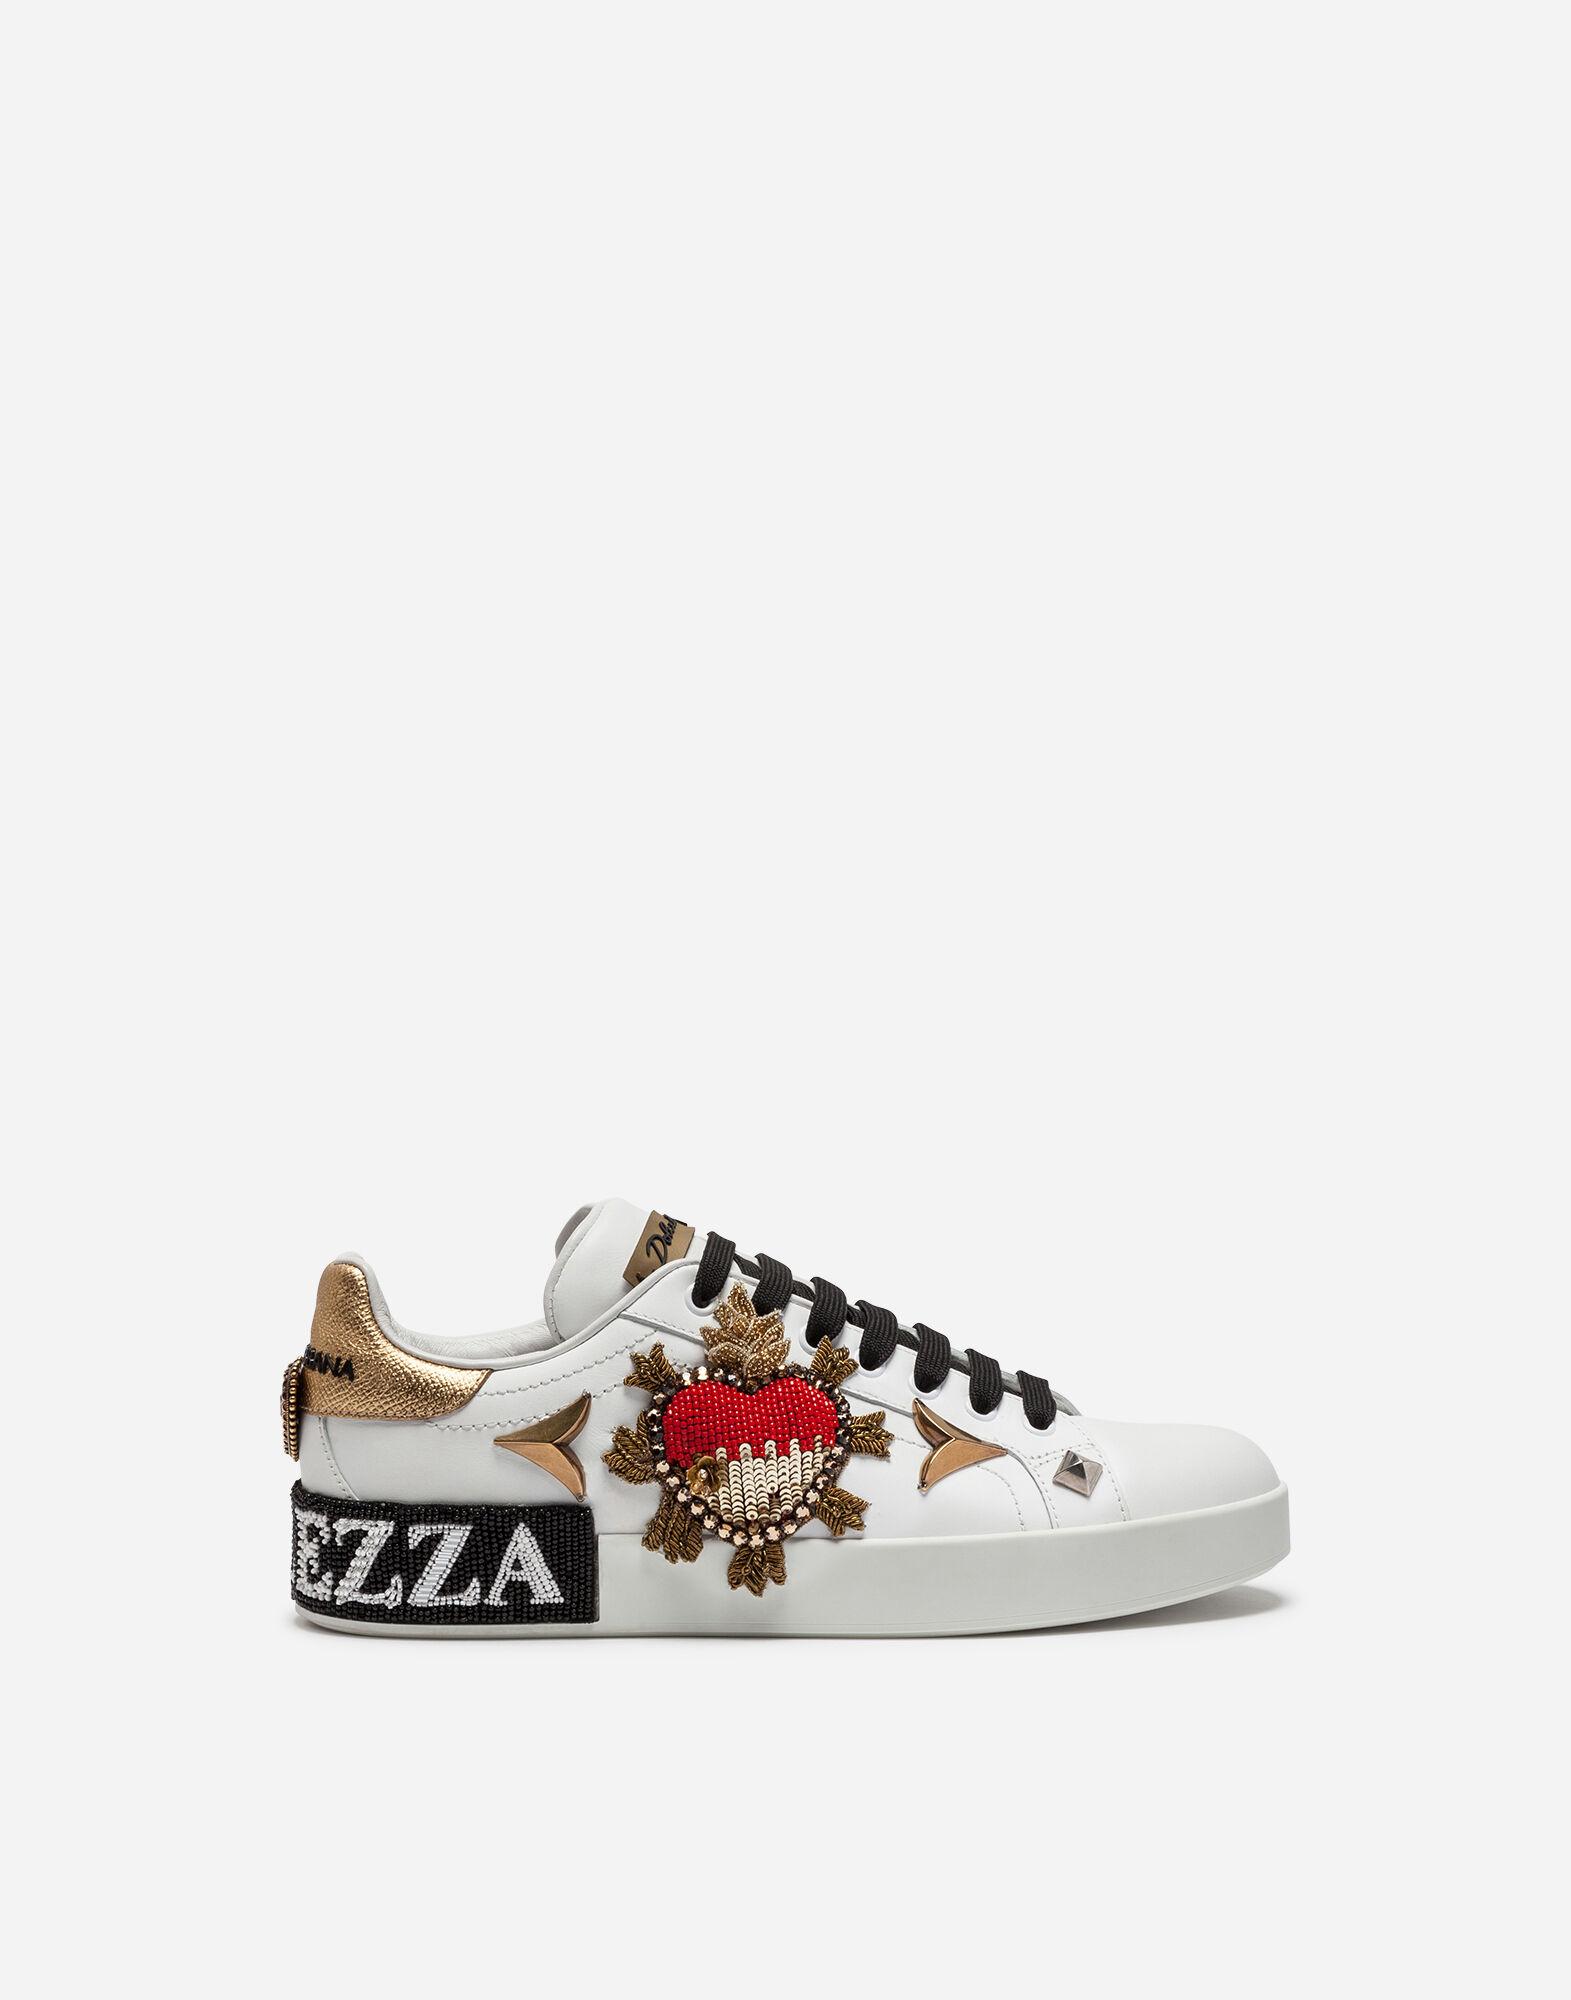 Dolce & Gabbana White & Pink Writing Sneakers 2JMv2XXeu